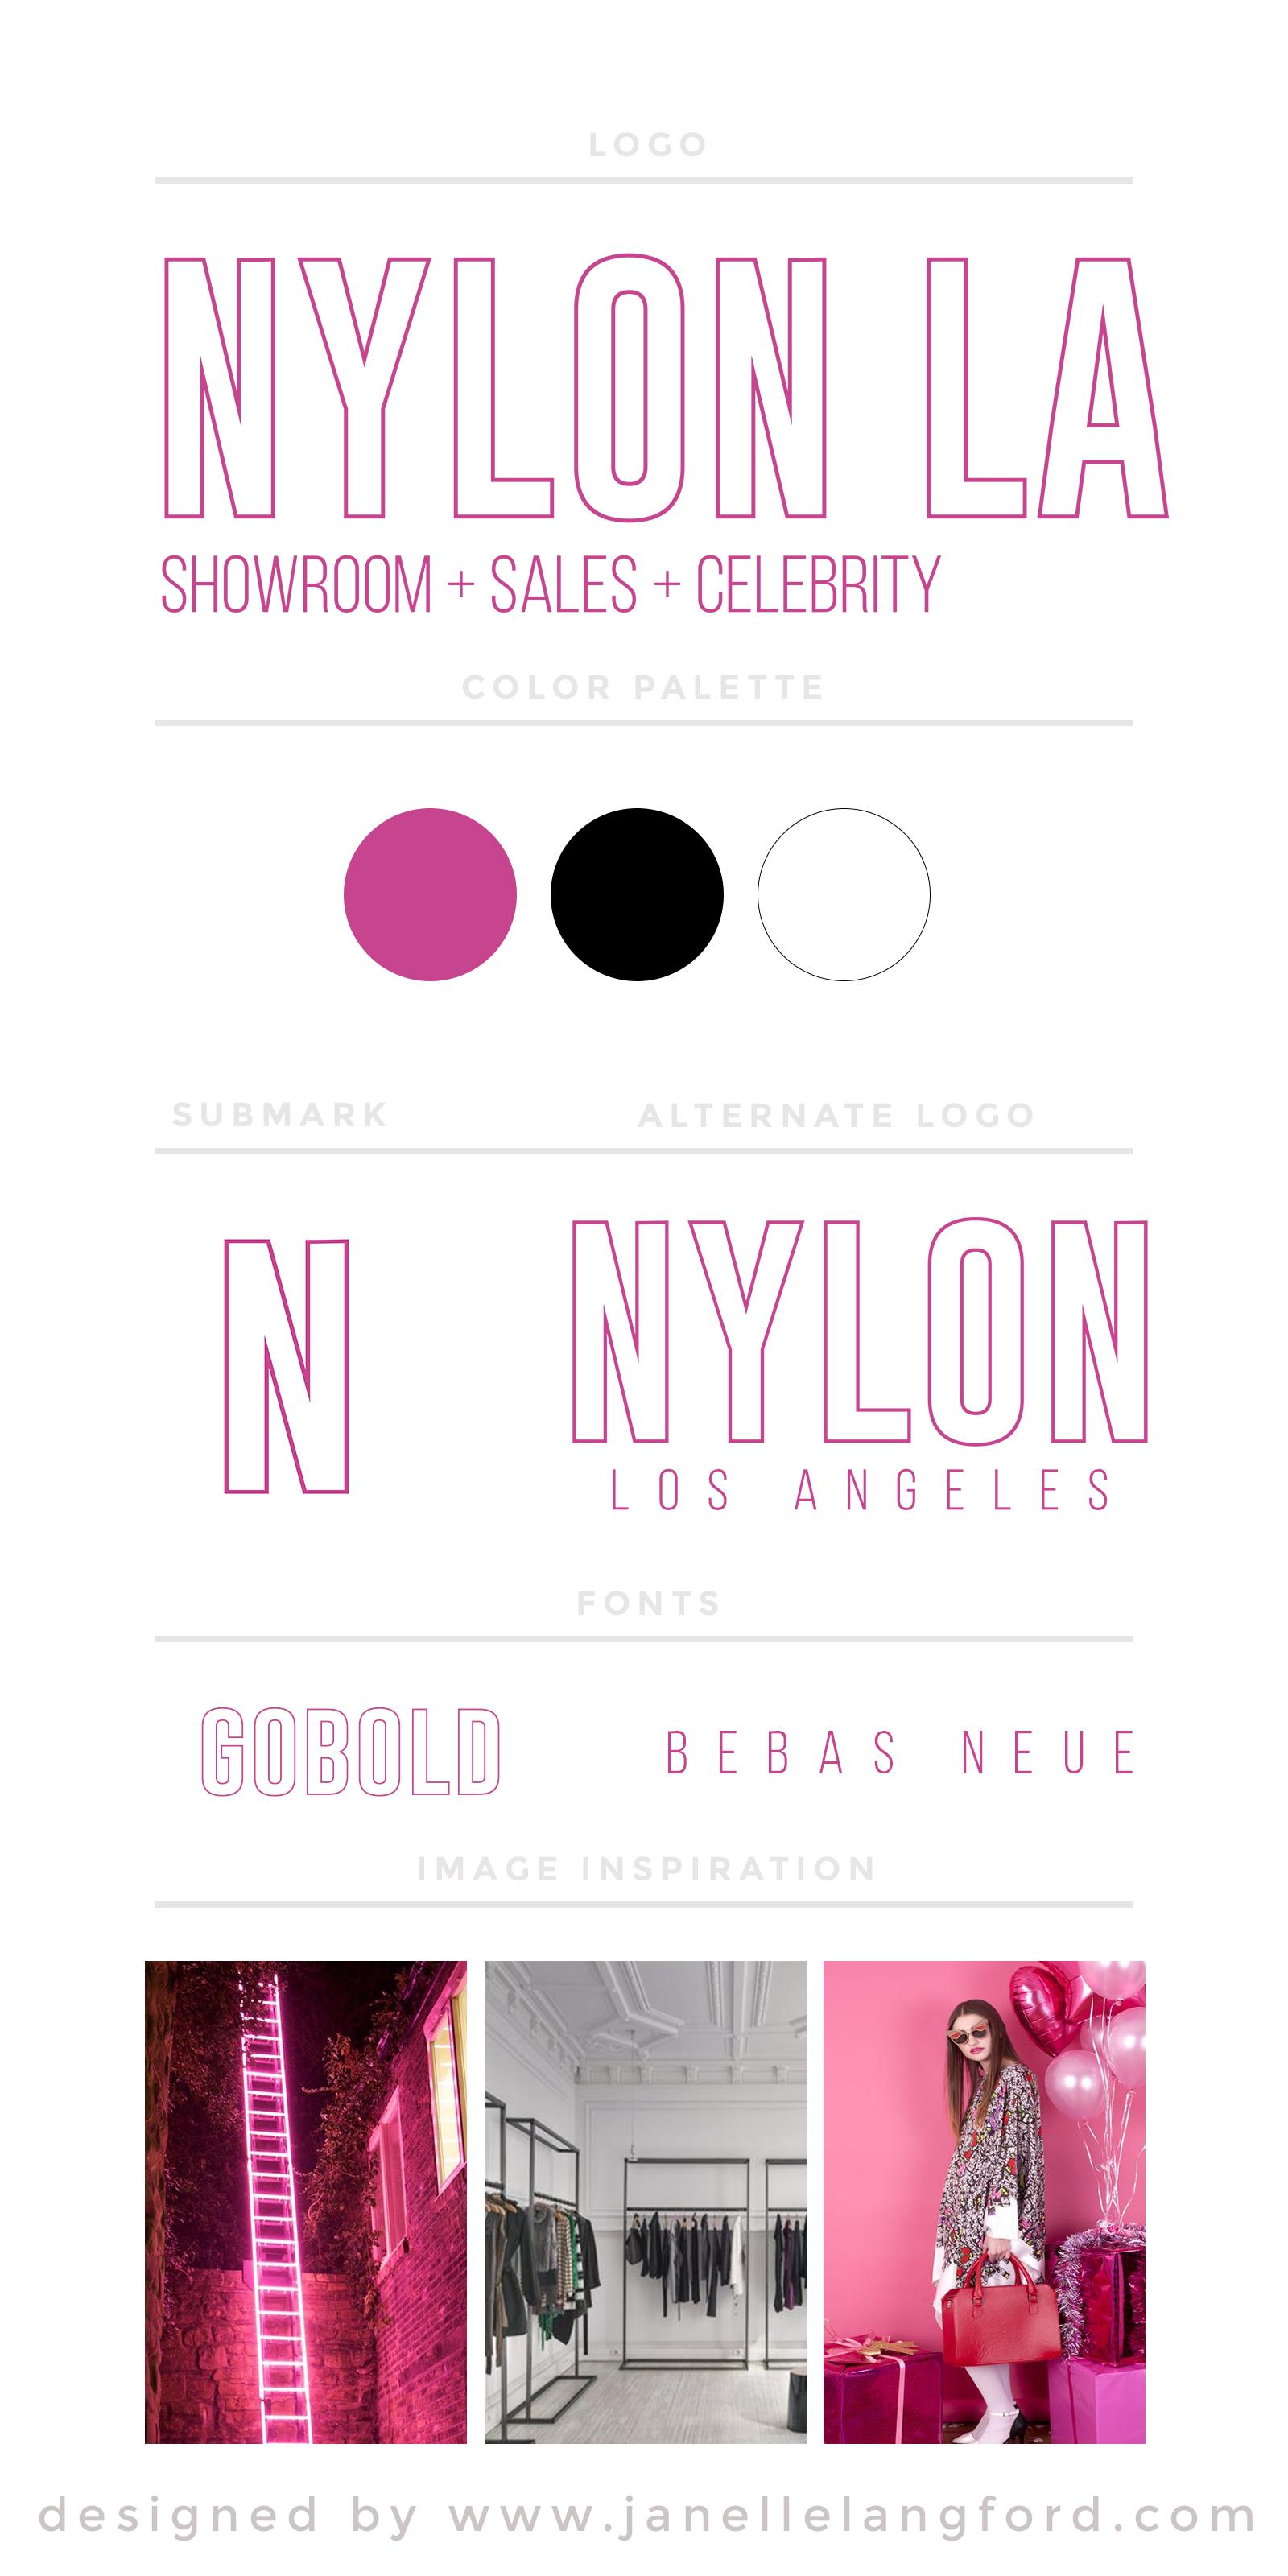 nylon branding board.jpg